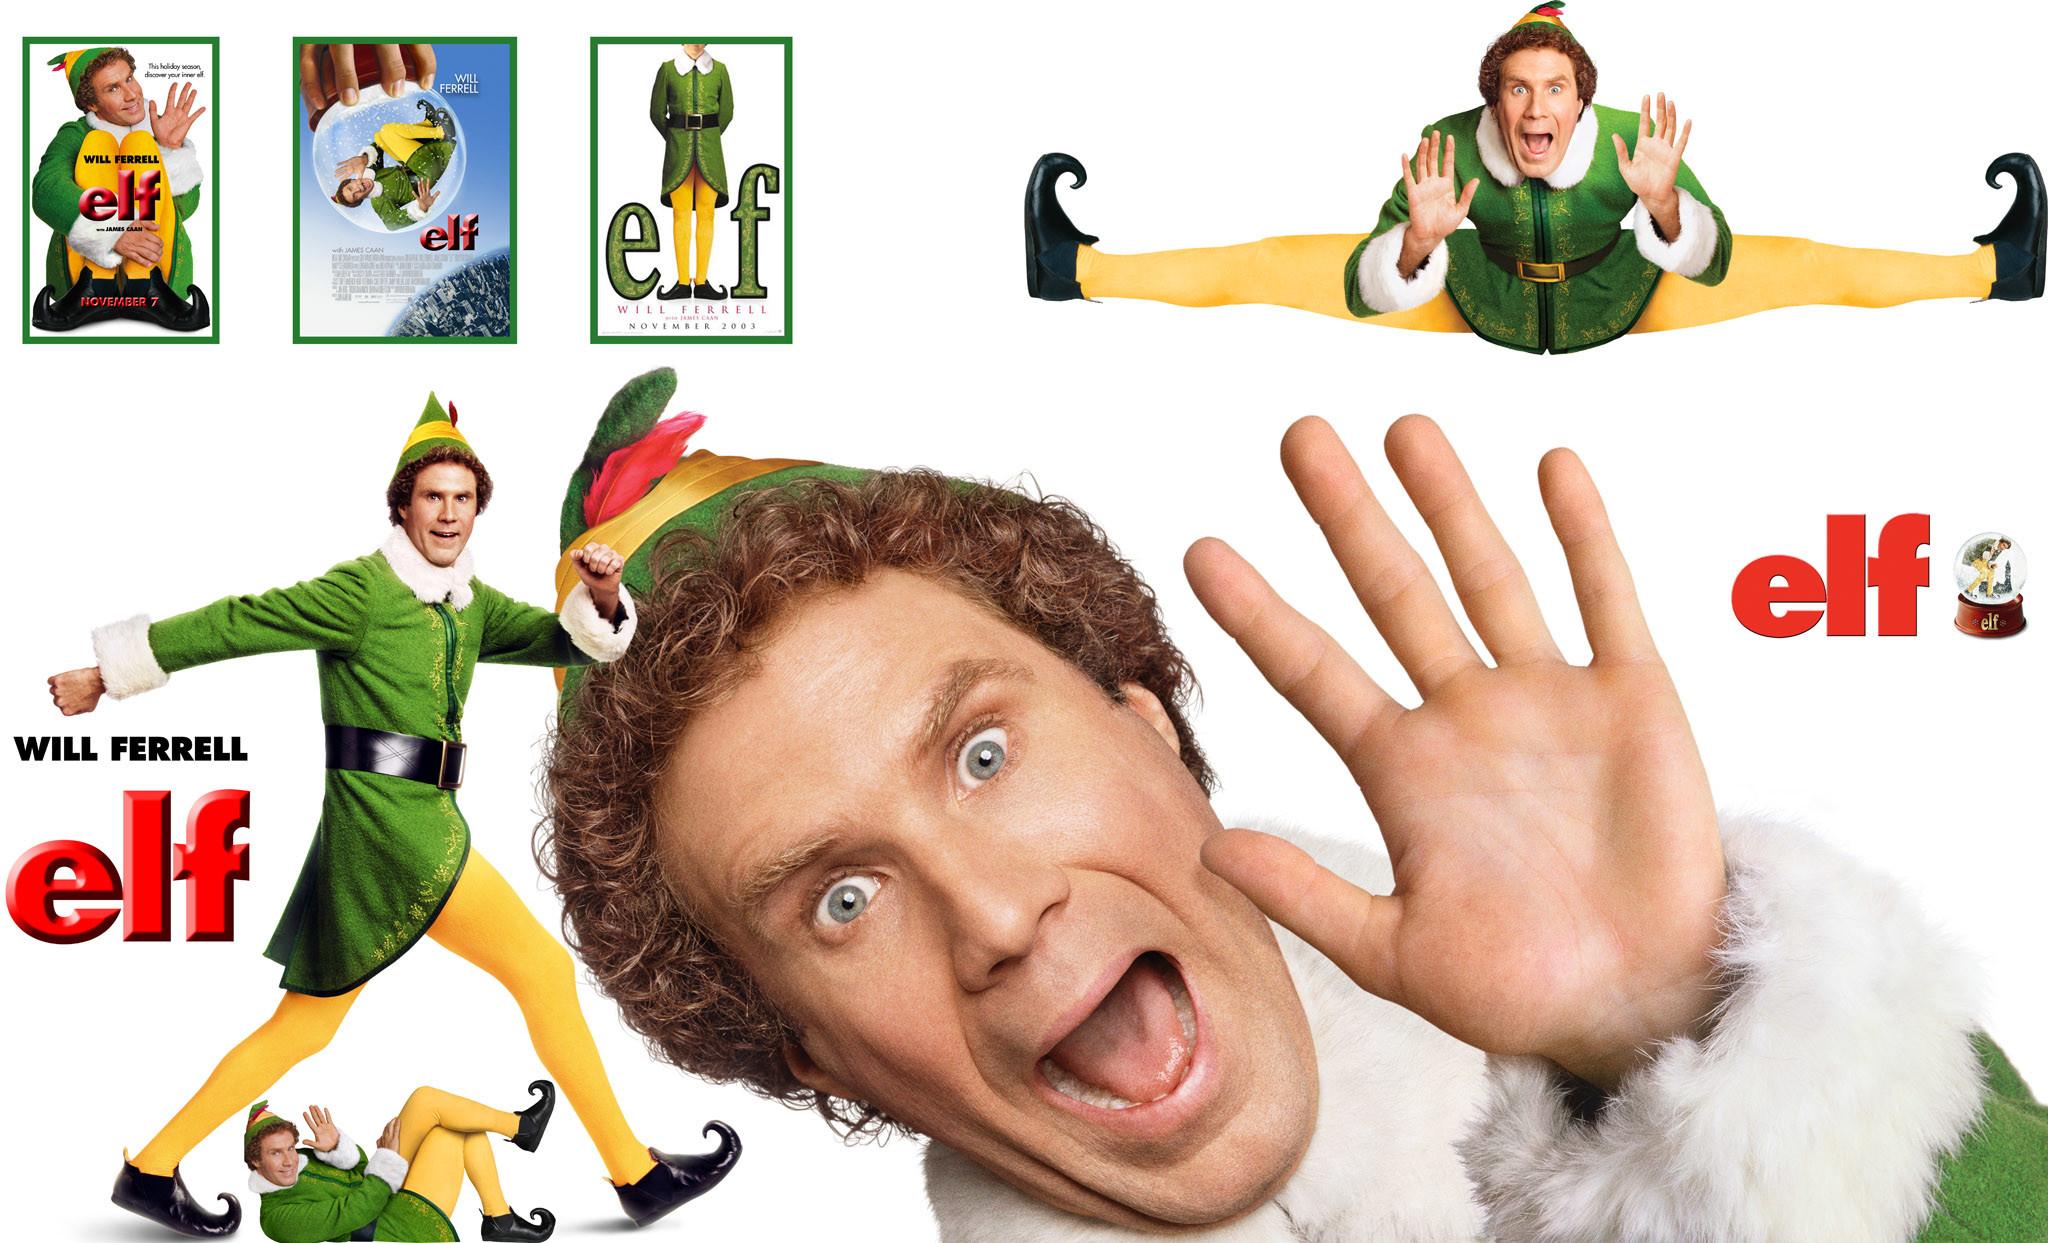 Elf The Movie Wallpaper